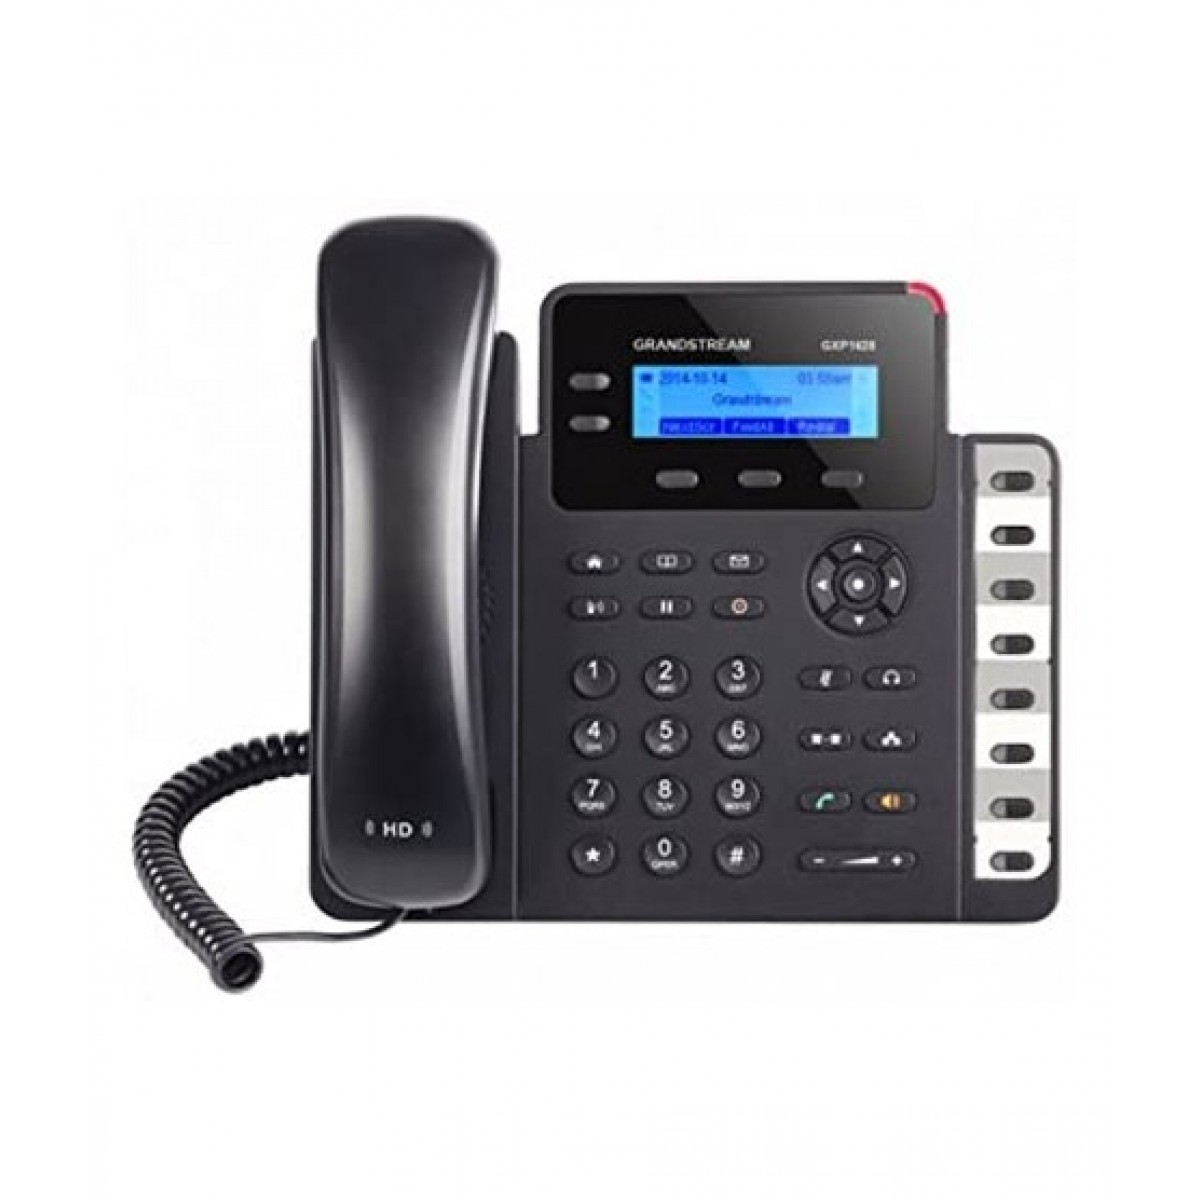 Grandstream VoIP Landline Telephone GXP1628